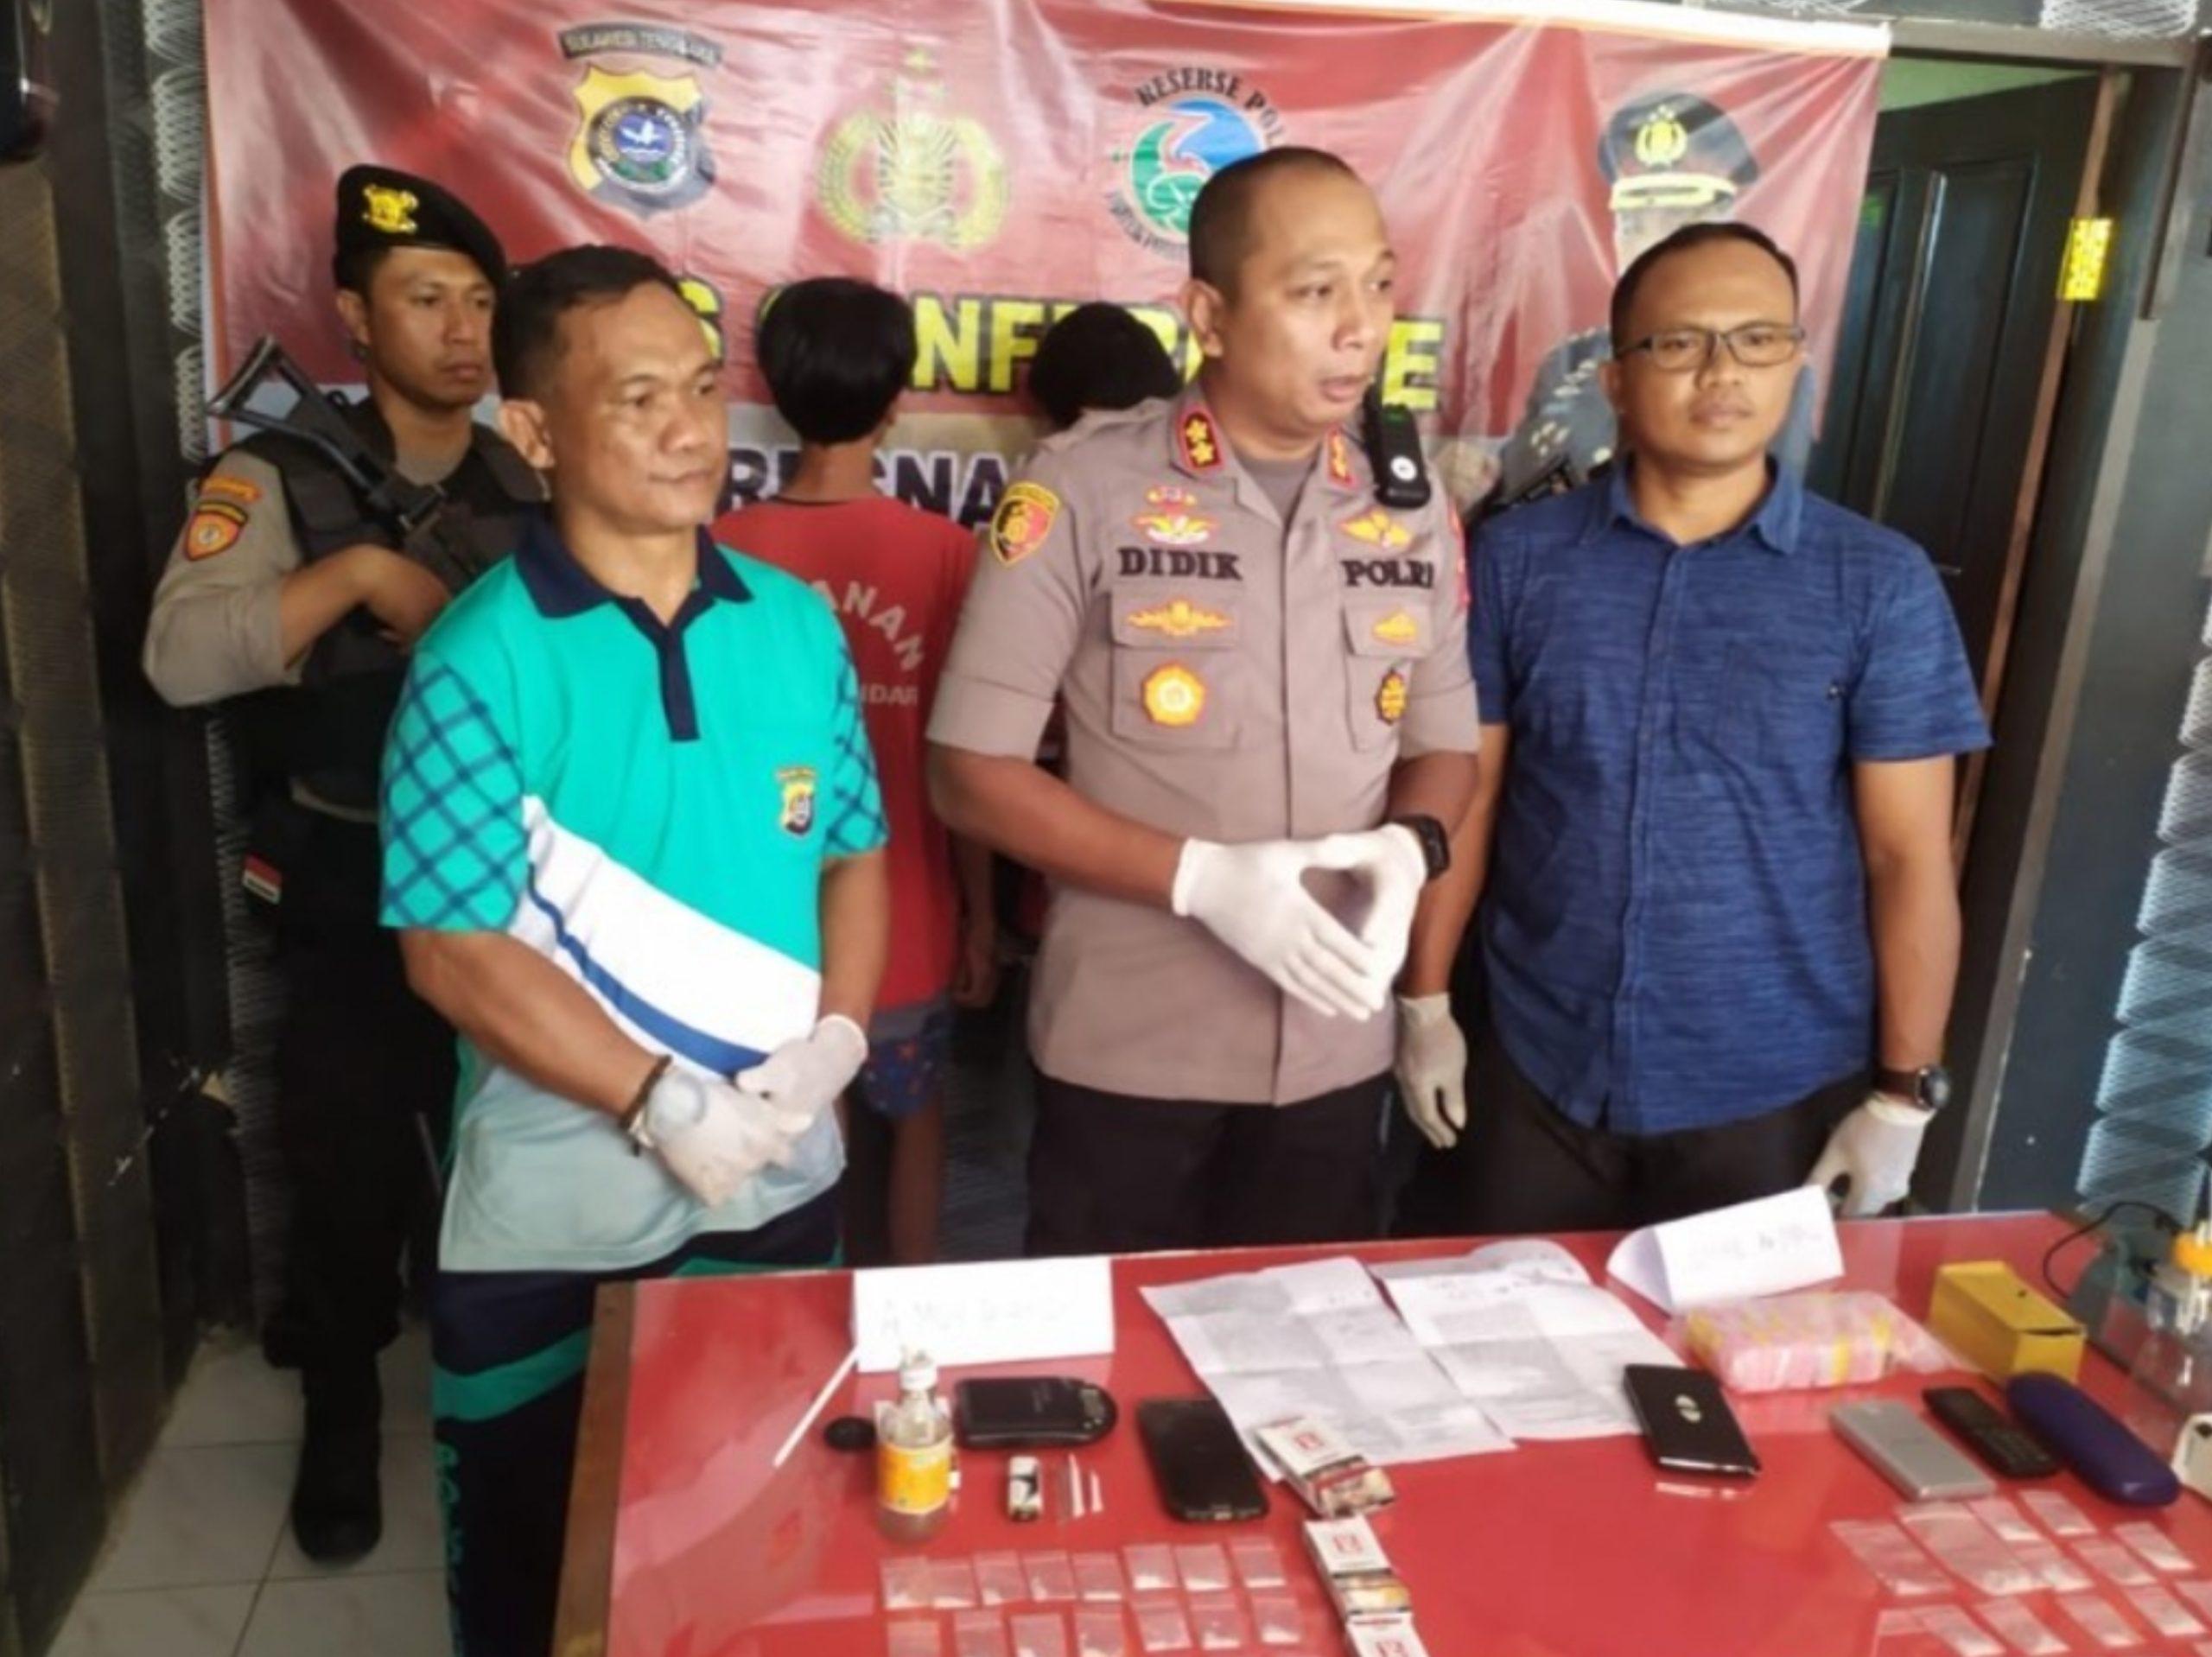 Dua orang pengedar narkoba diamankan oleh Satuan Narkoba Polres Kendari. (Foto : Istimewa)